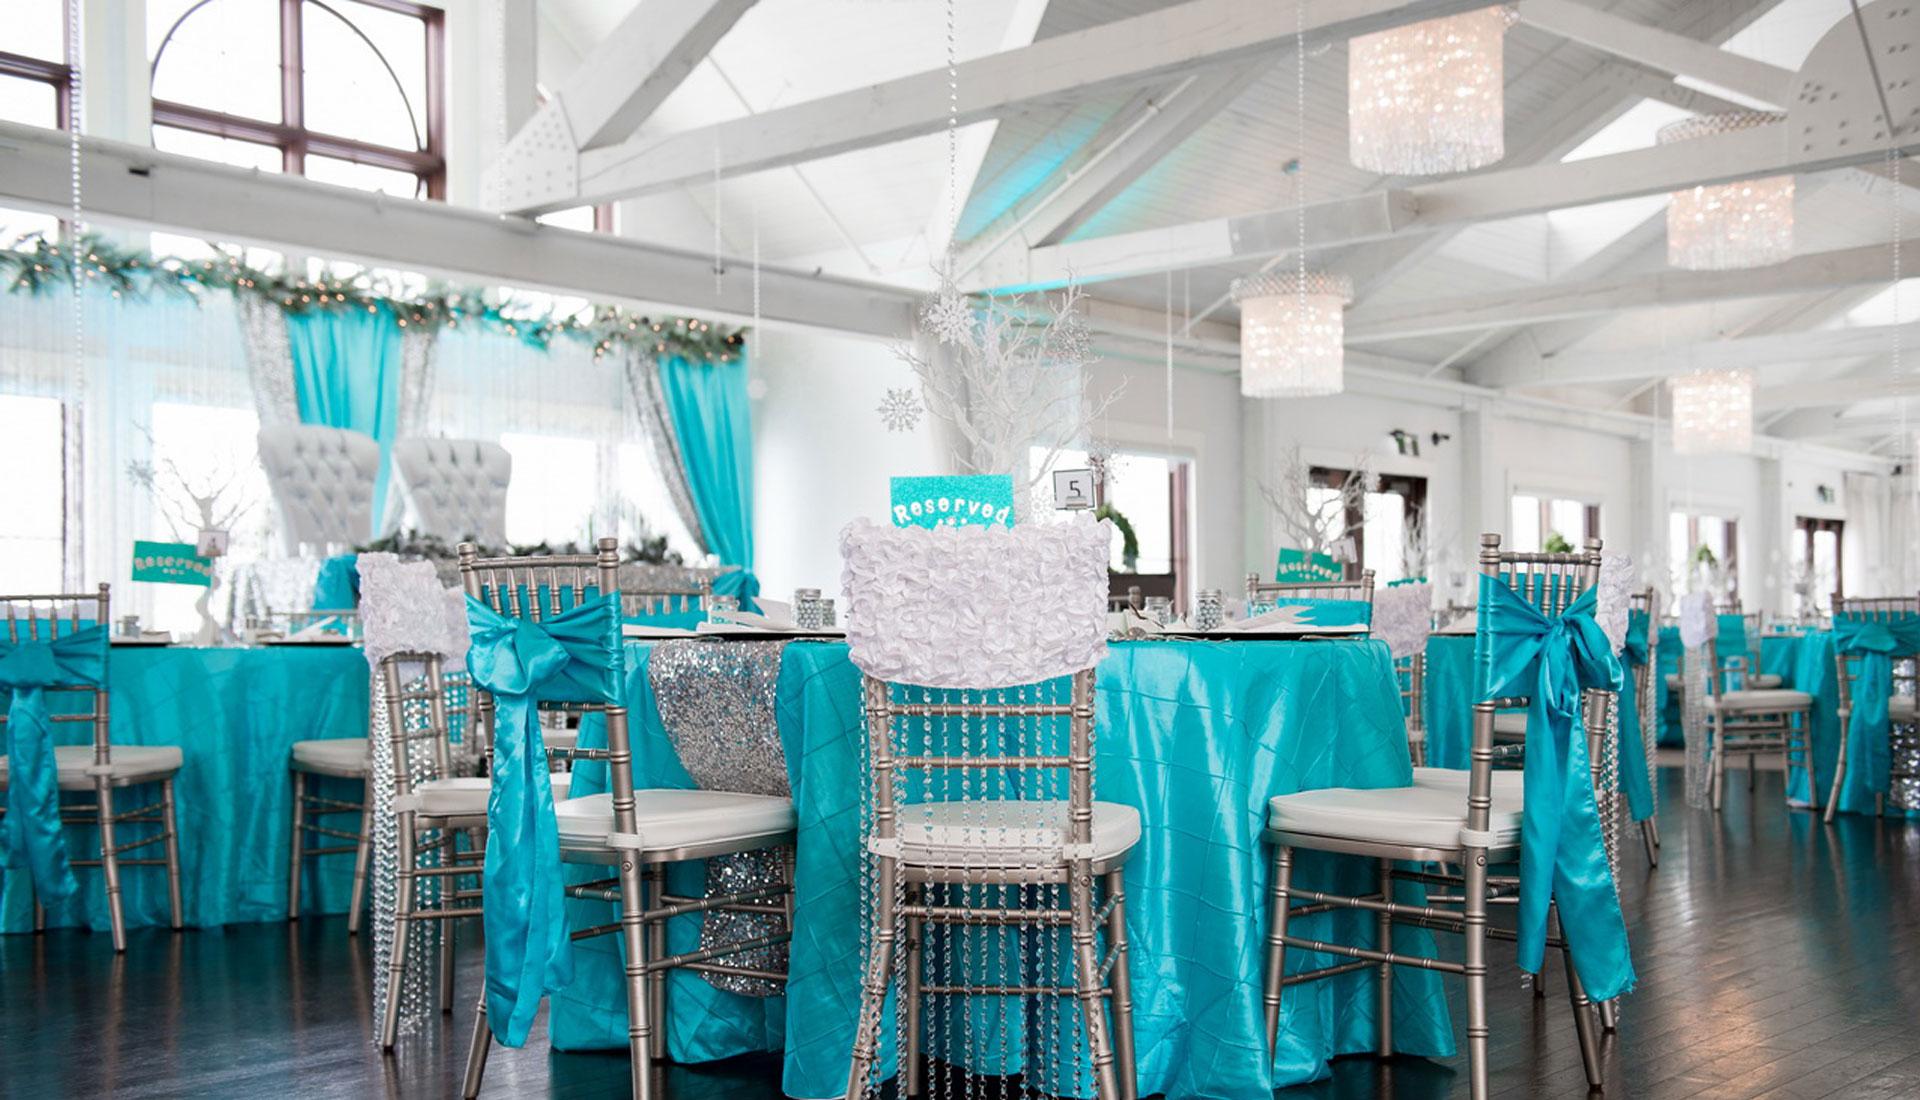 Wedding Dream | wedding decorations and rentals